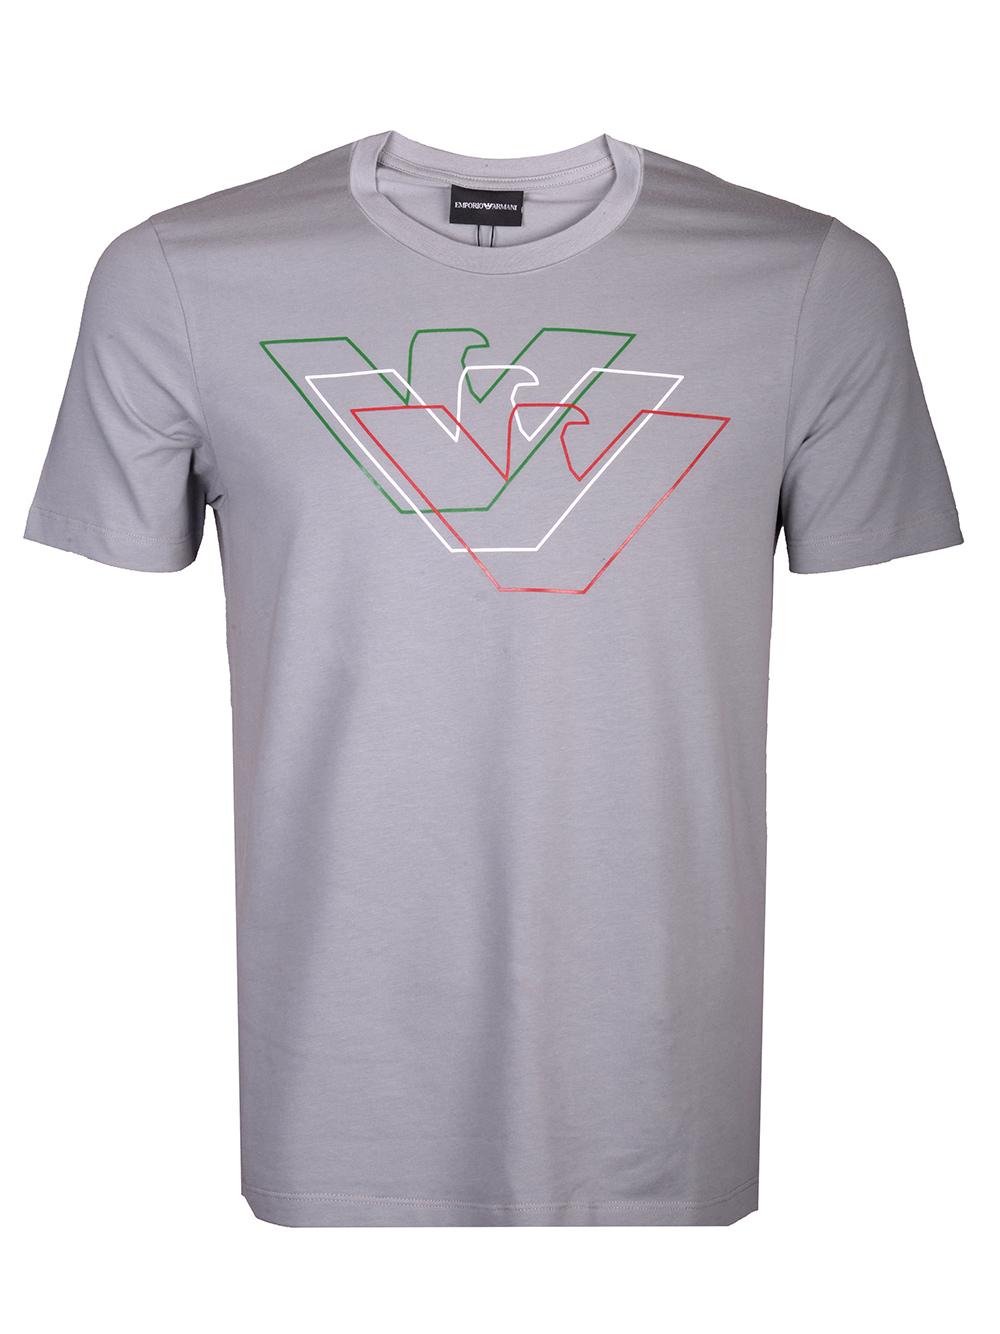 EMPORIO ARMANI Μπλούζα T-shirt 3H1T71 1J11Z-0653 ΓΚΡΙ